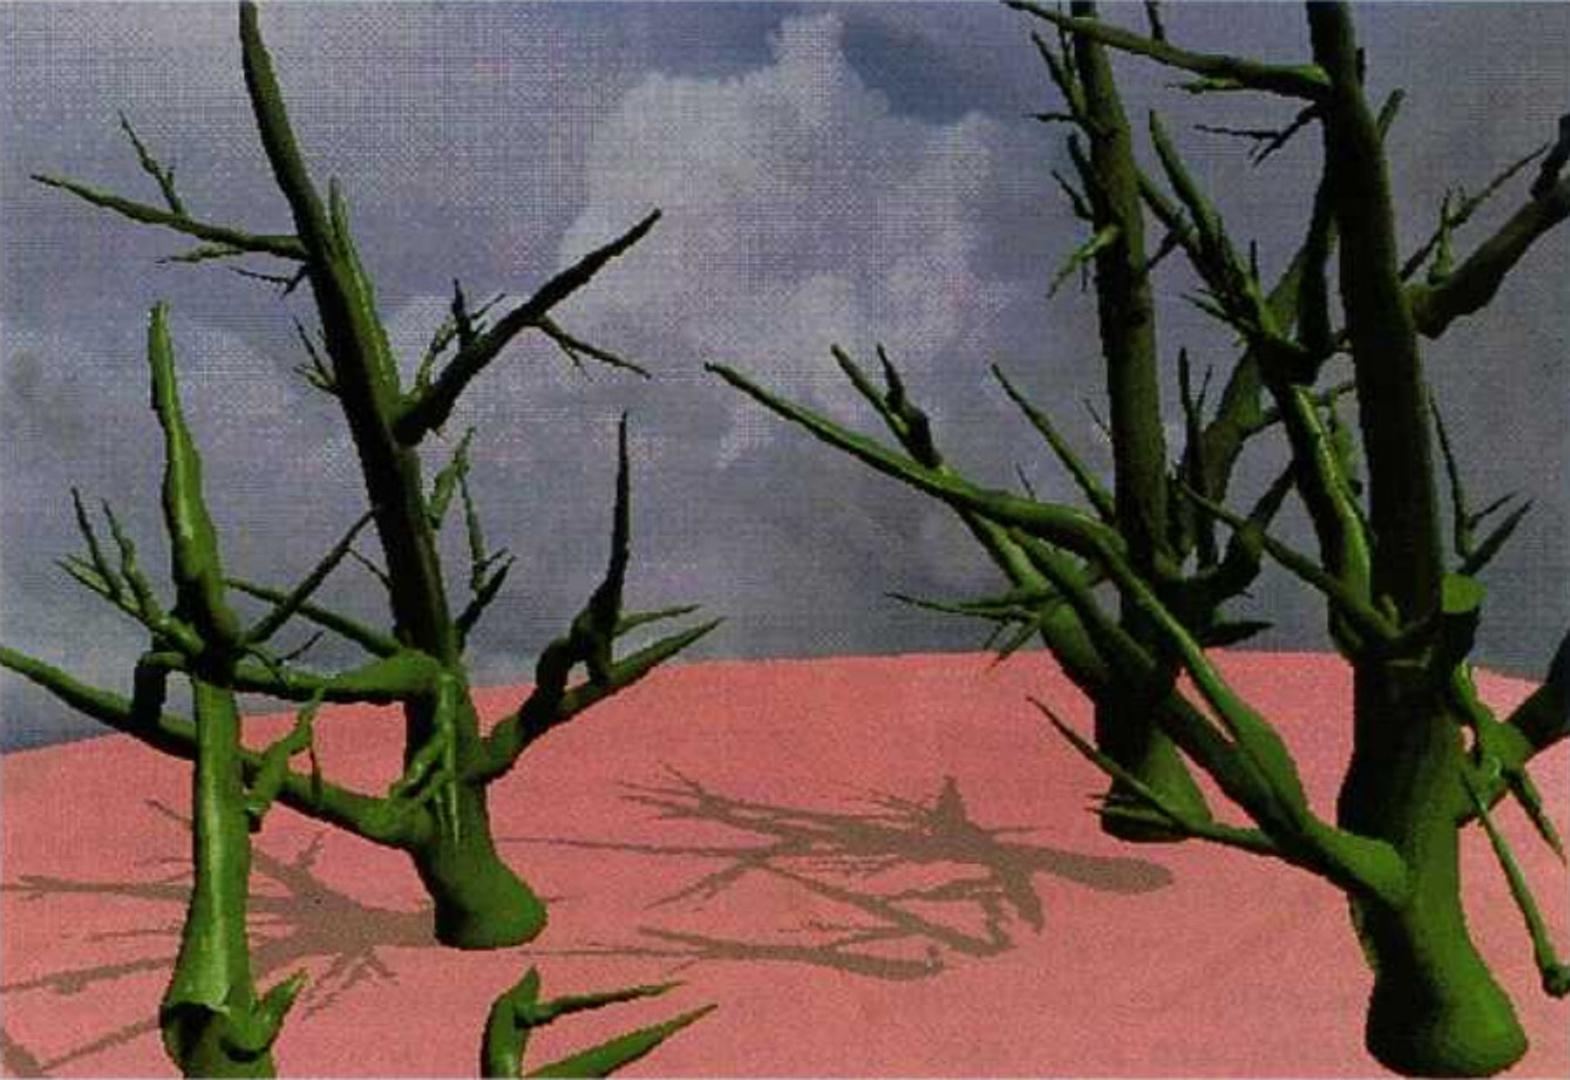 ©, Nina Pope, Herbaceous Protection, Unconscious, Bloom, Keepsake